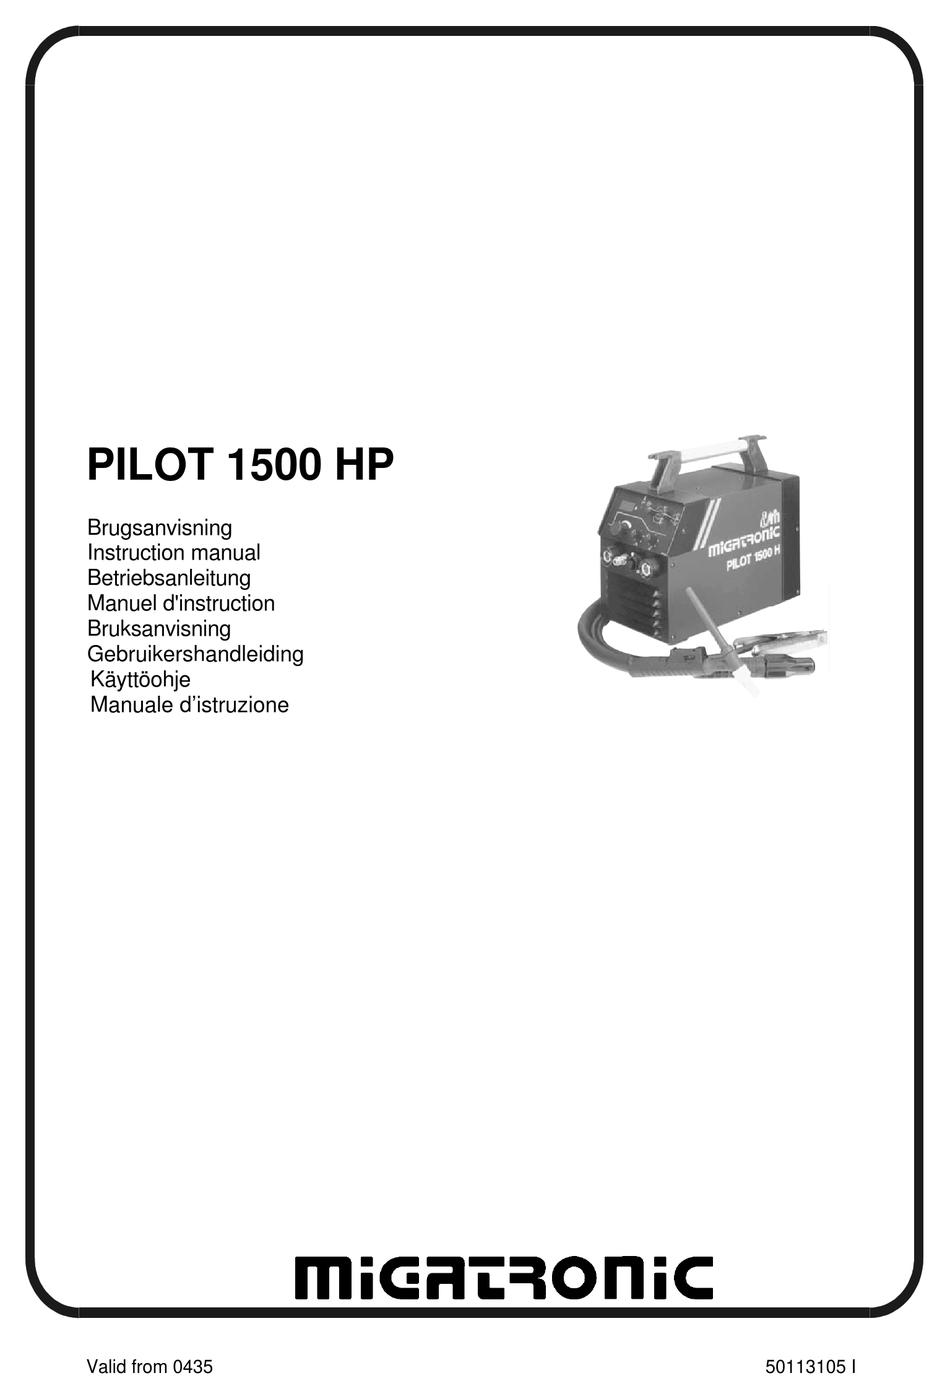 MIGATRONIC PILOT 1500 HP INSTRUCTION MANUAL Pdf Download